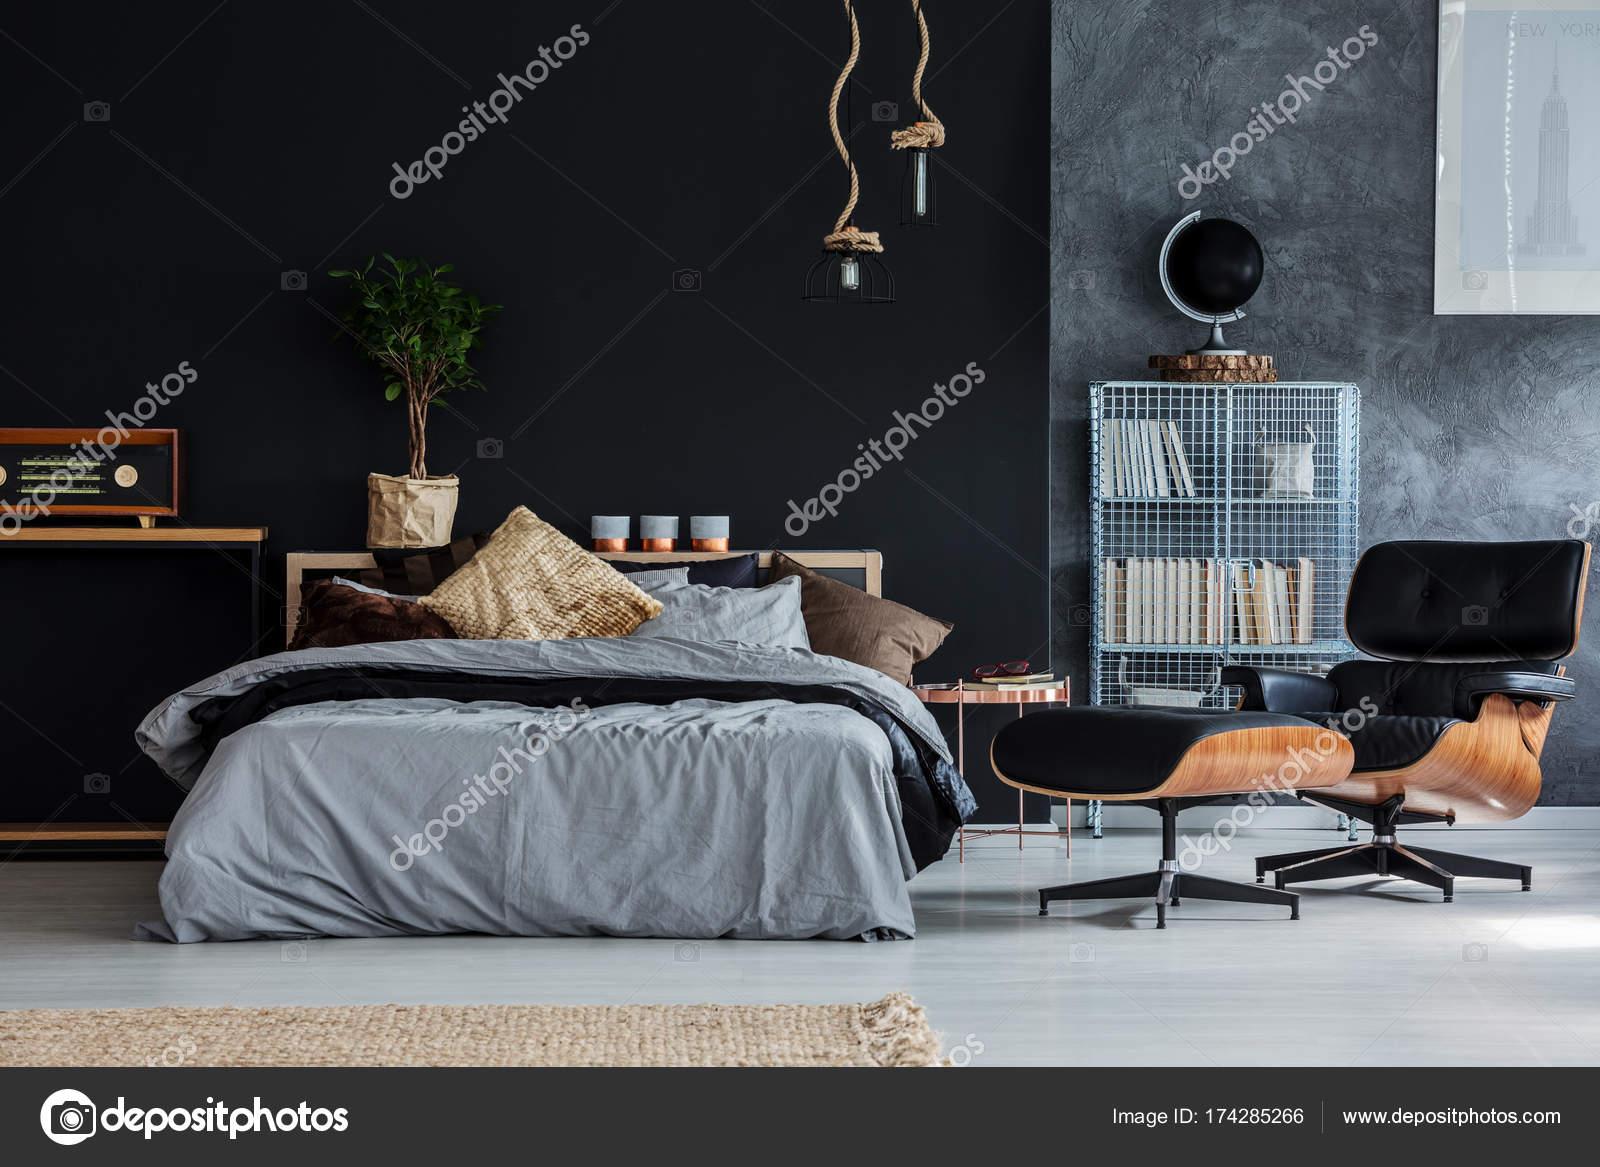 - Guy Bedroom With Chaise Lounge — Stock Photo © Photographee.eu